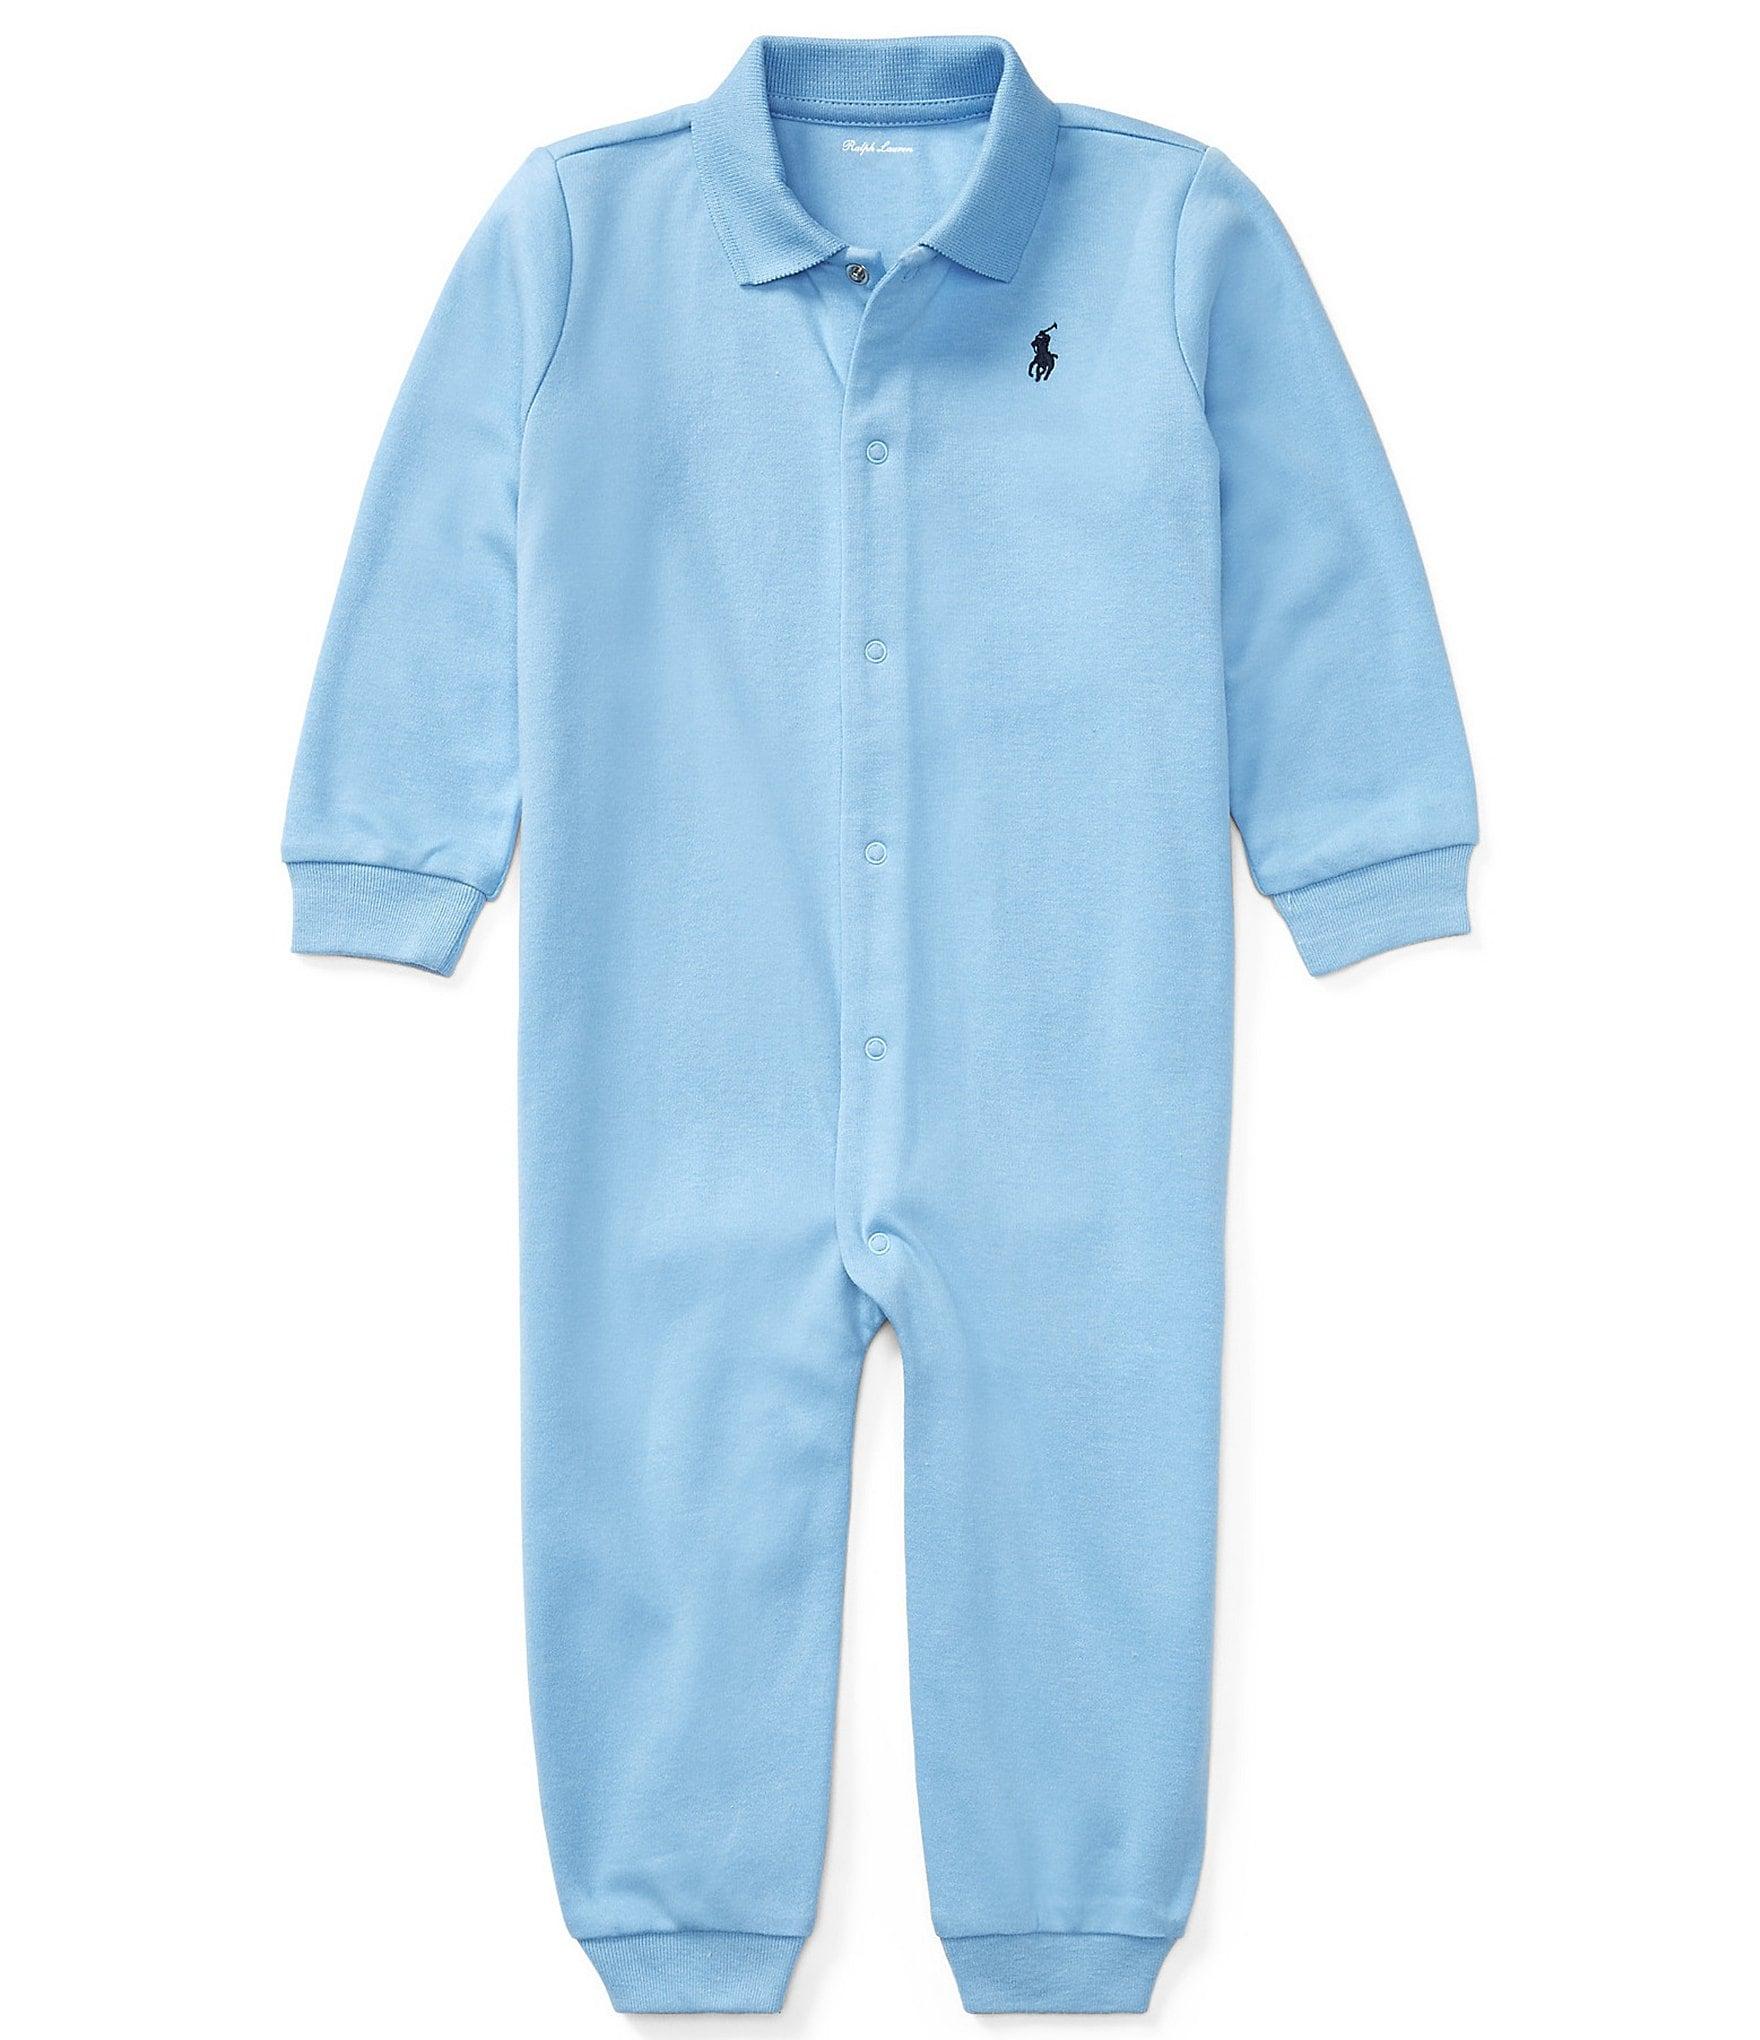 Ralph Lauren Baby Boys Clothing | Dillards